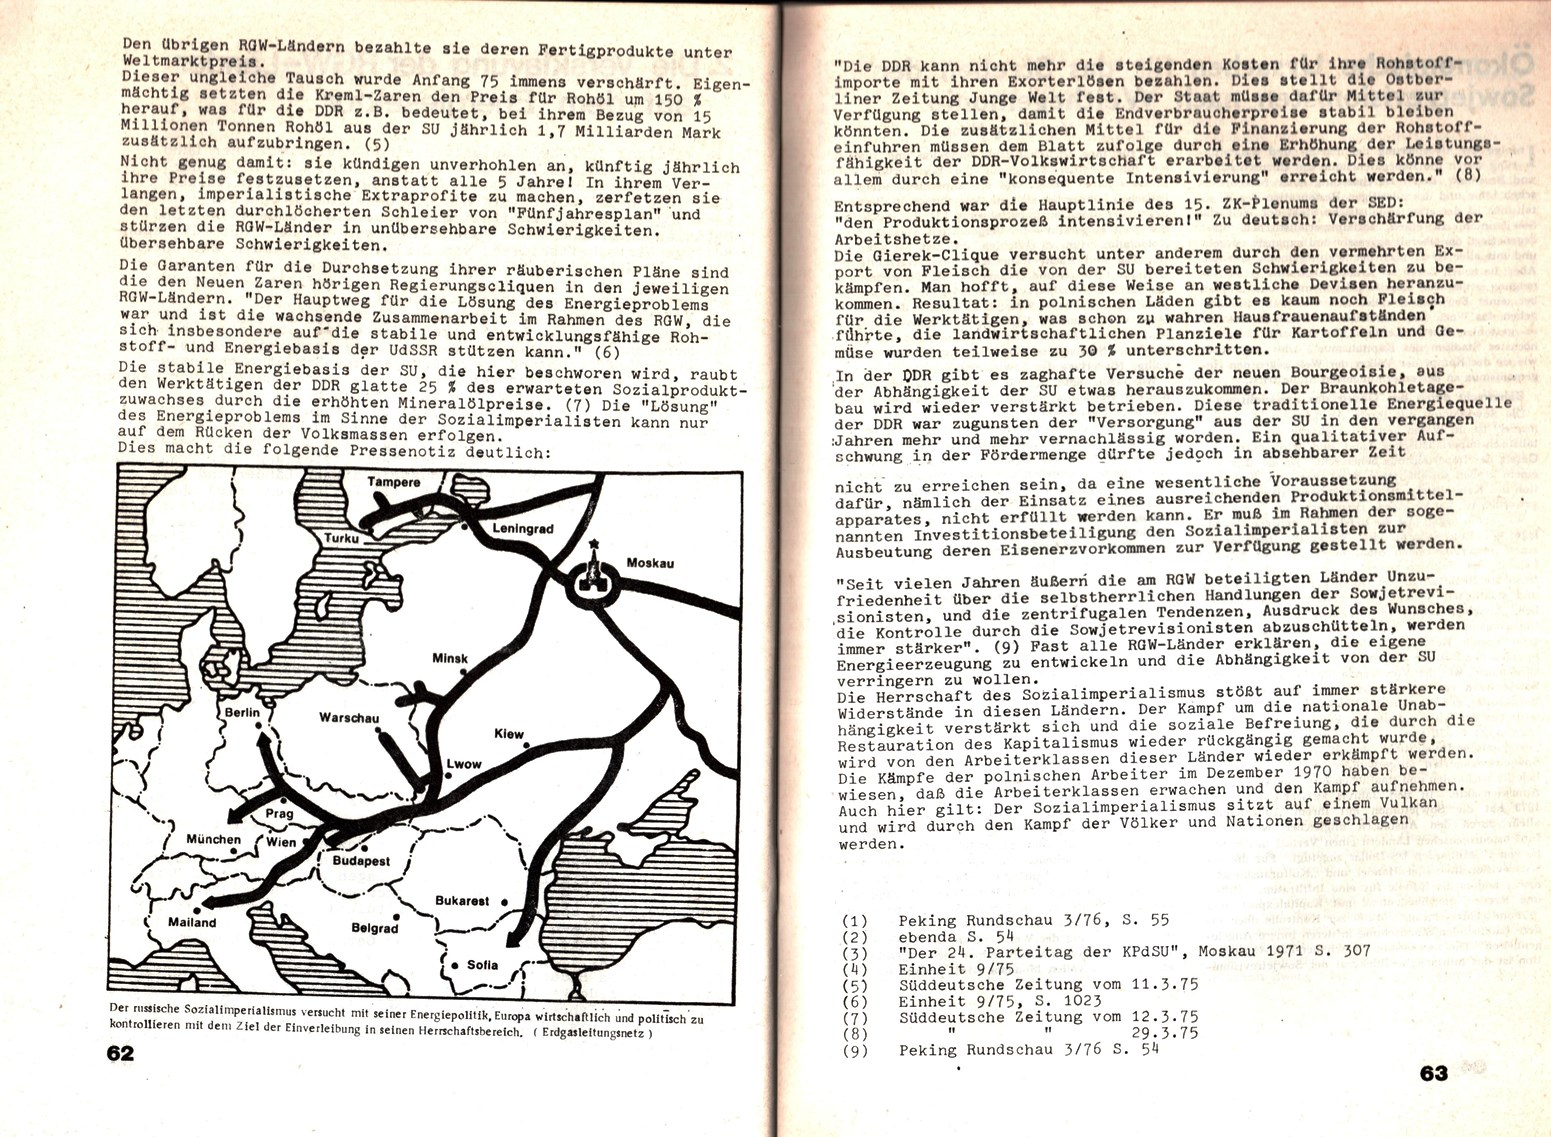 KSV_1976_Atomenergie_im_Kapitalismus_033